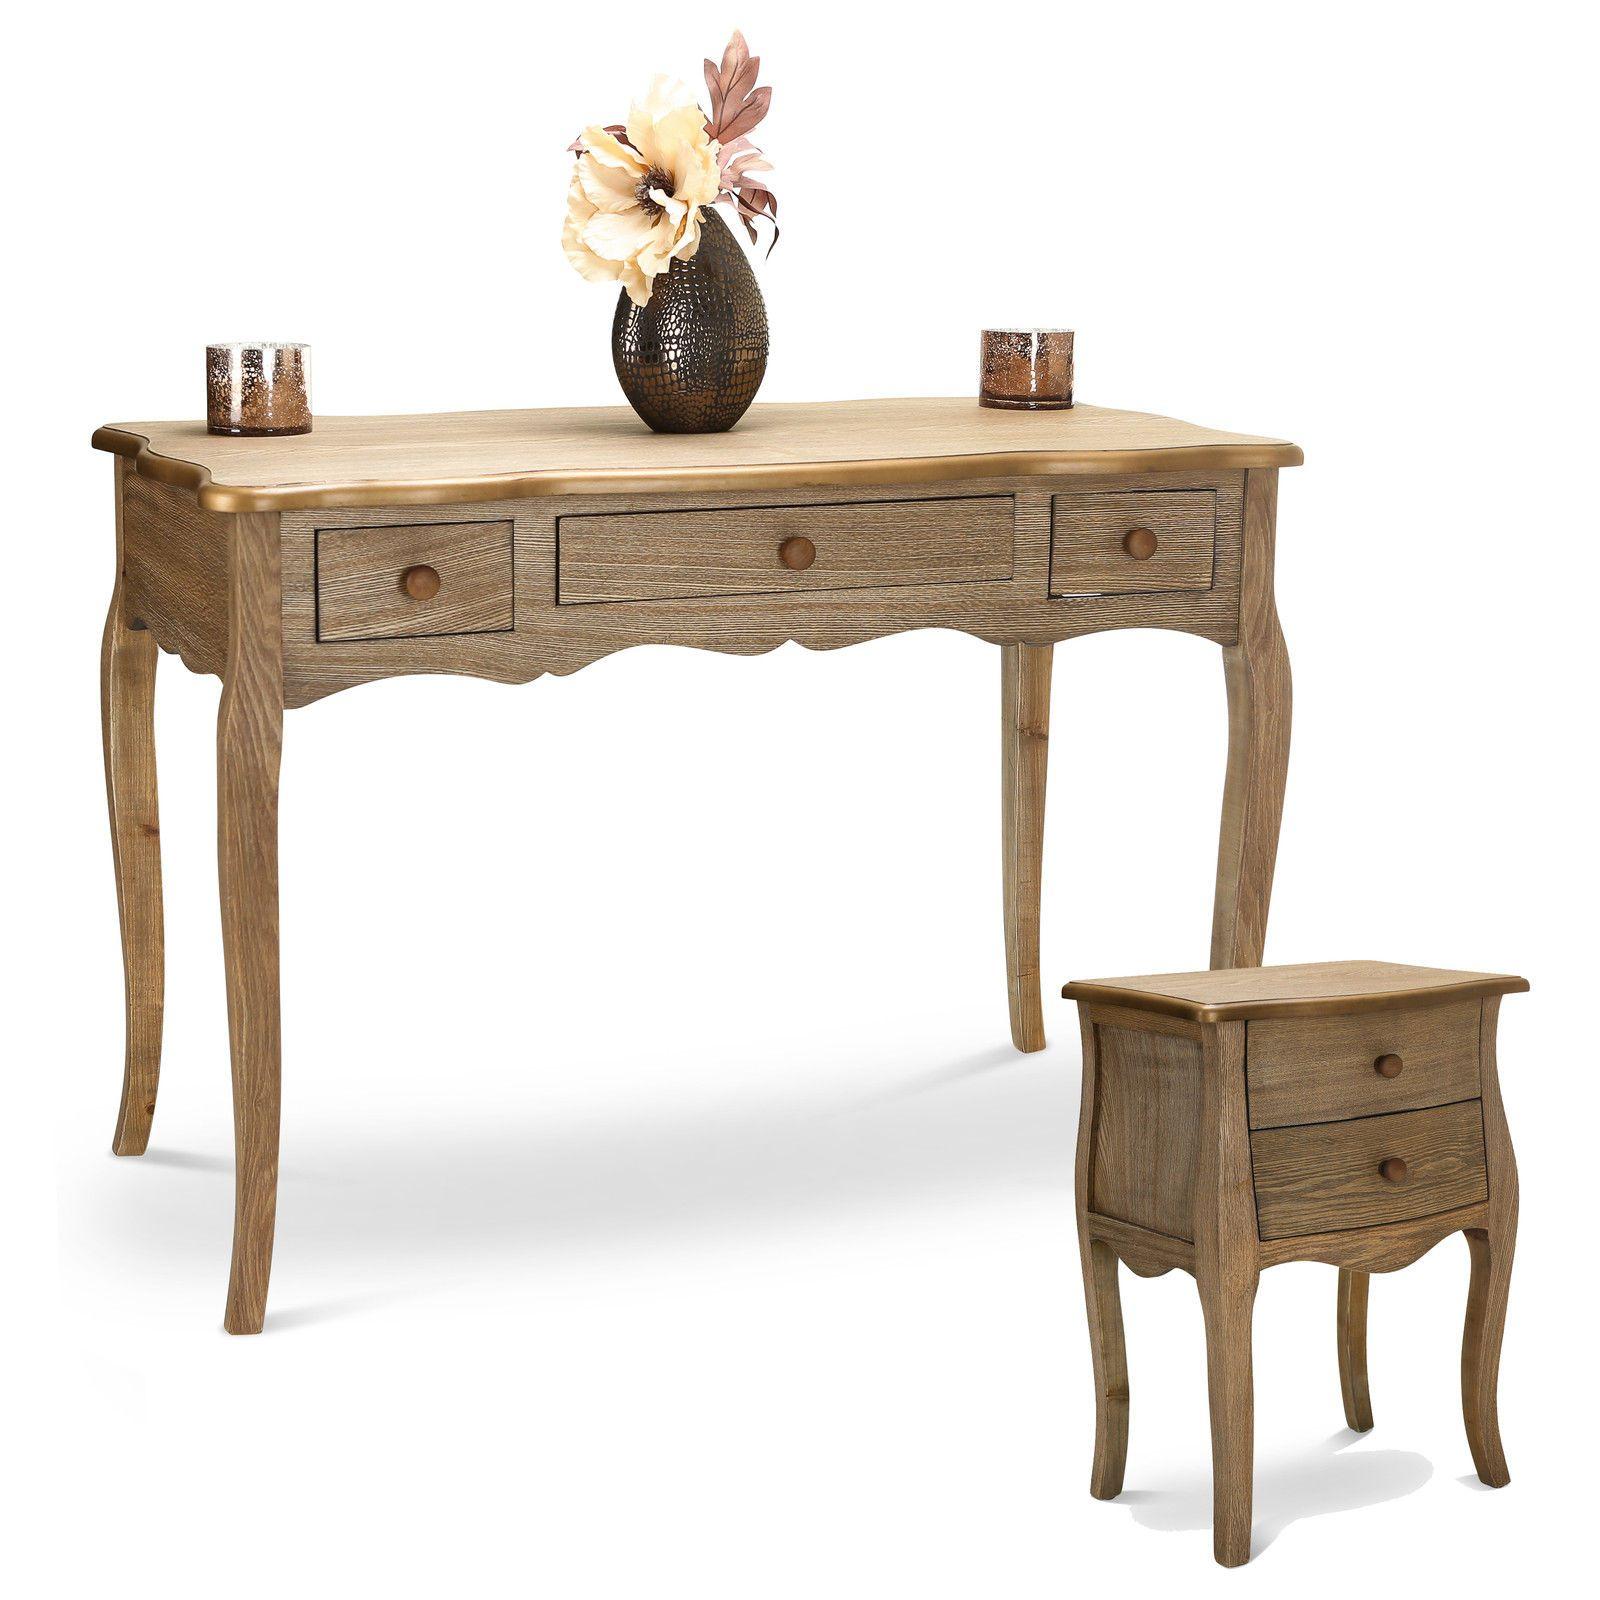 Shabby chic de madera consola mesilla franc s casa de for Bar de madera estilo campo